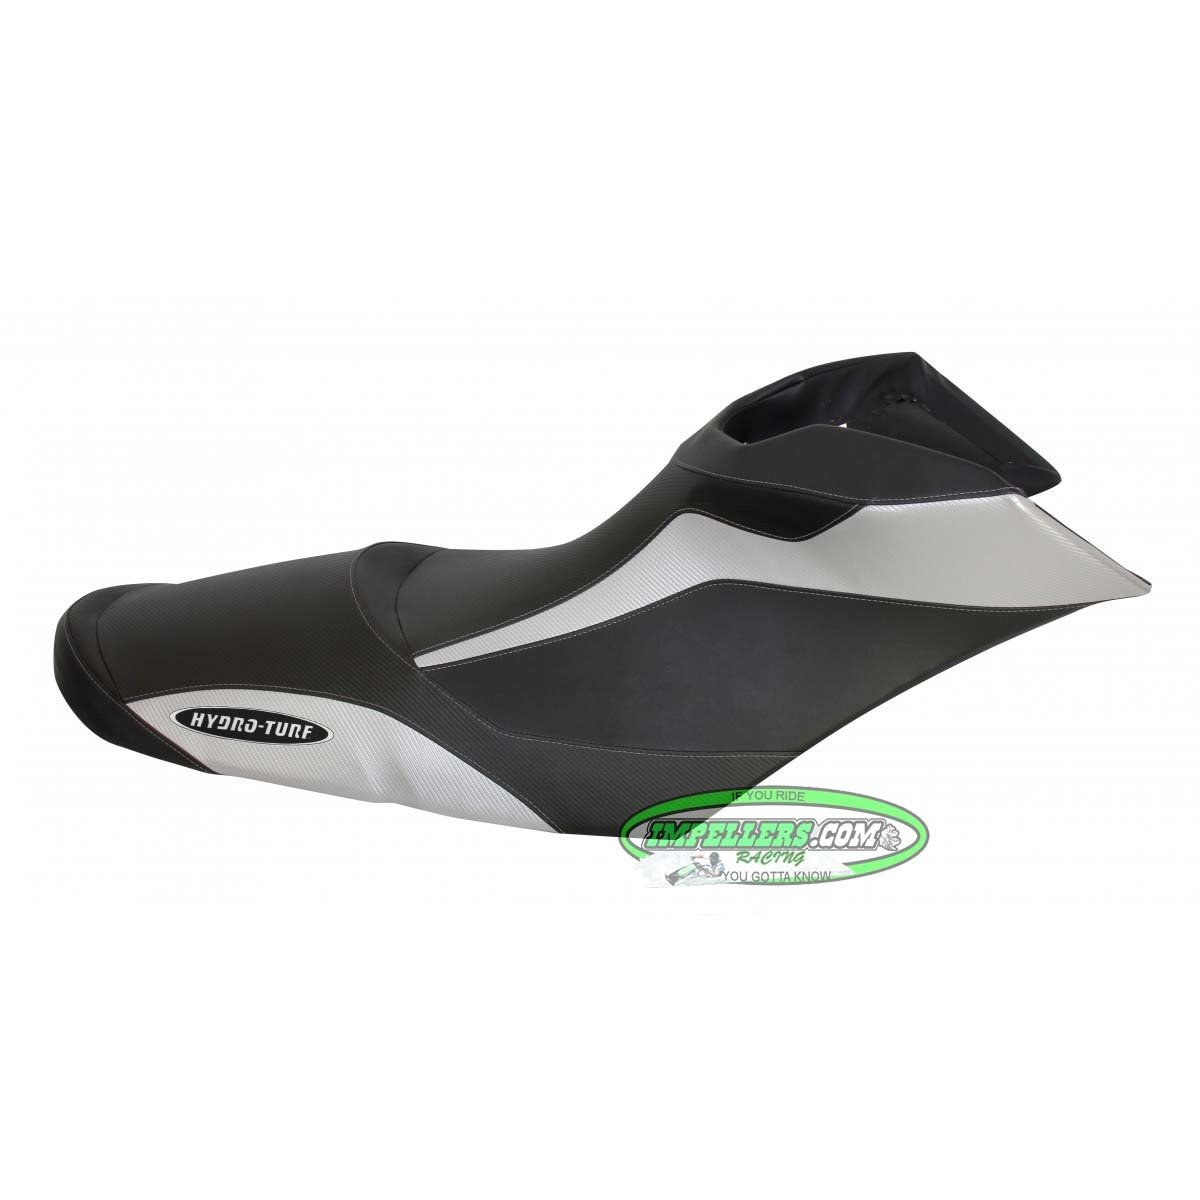 Sea-Doo Seat Cover RXP-X 260 (12-15) / RXP-X 300